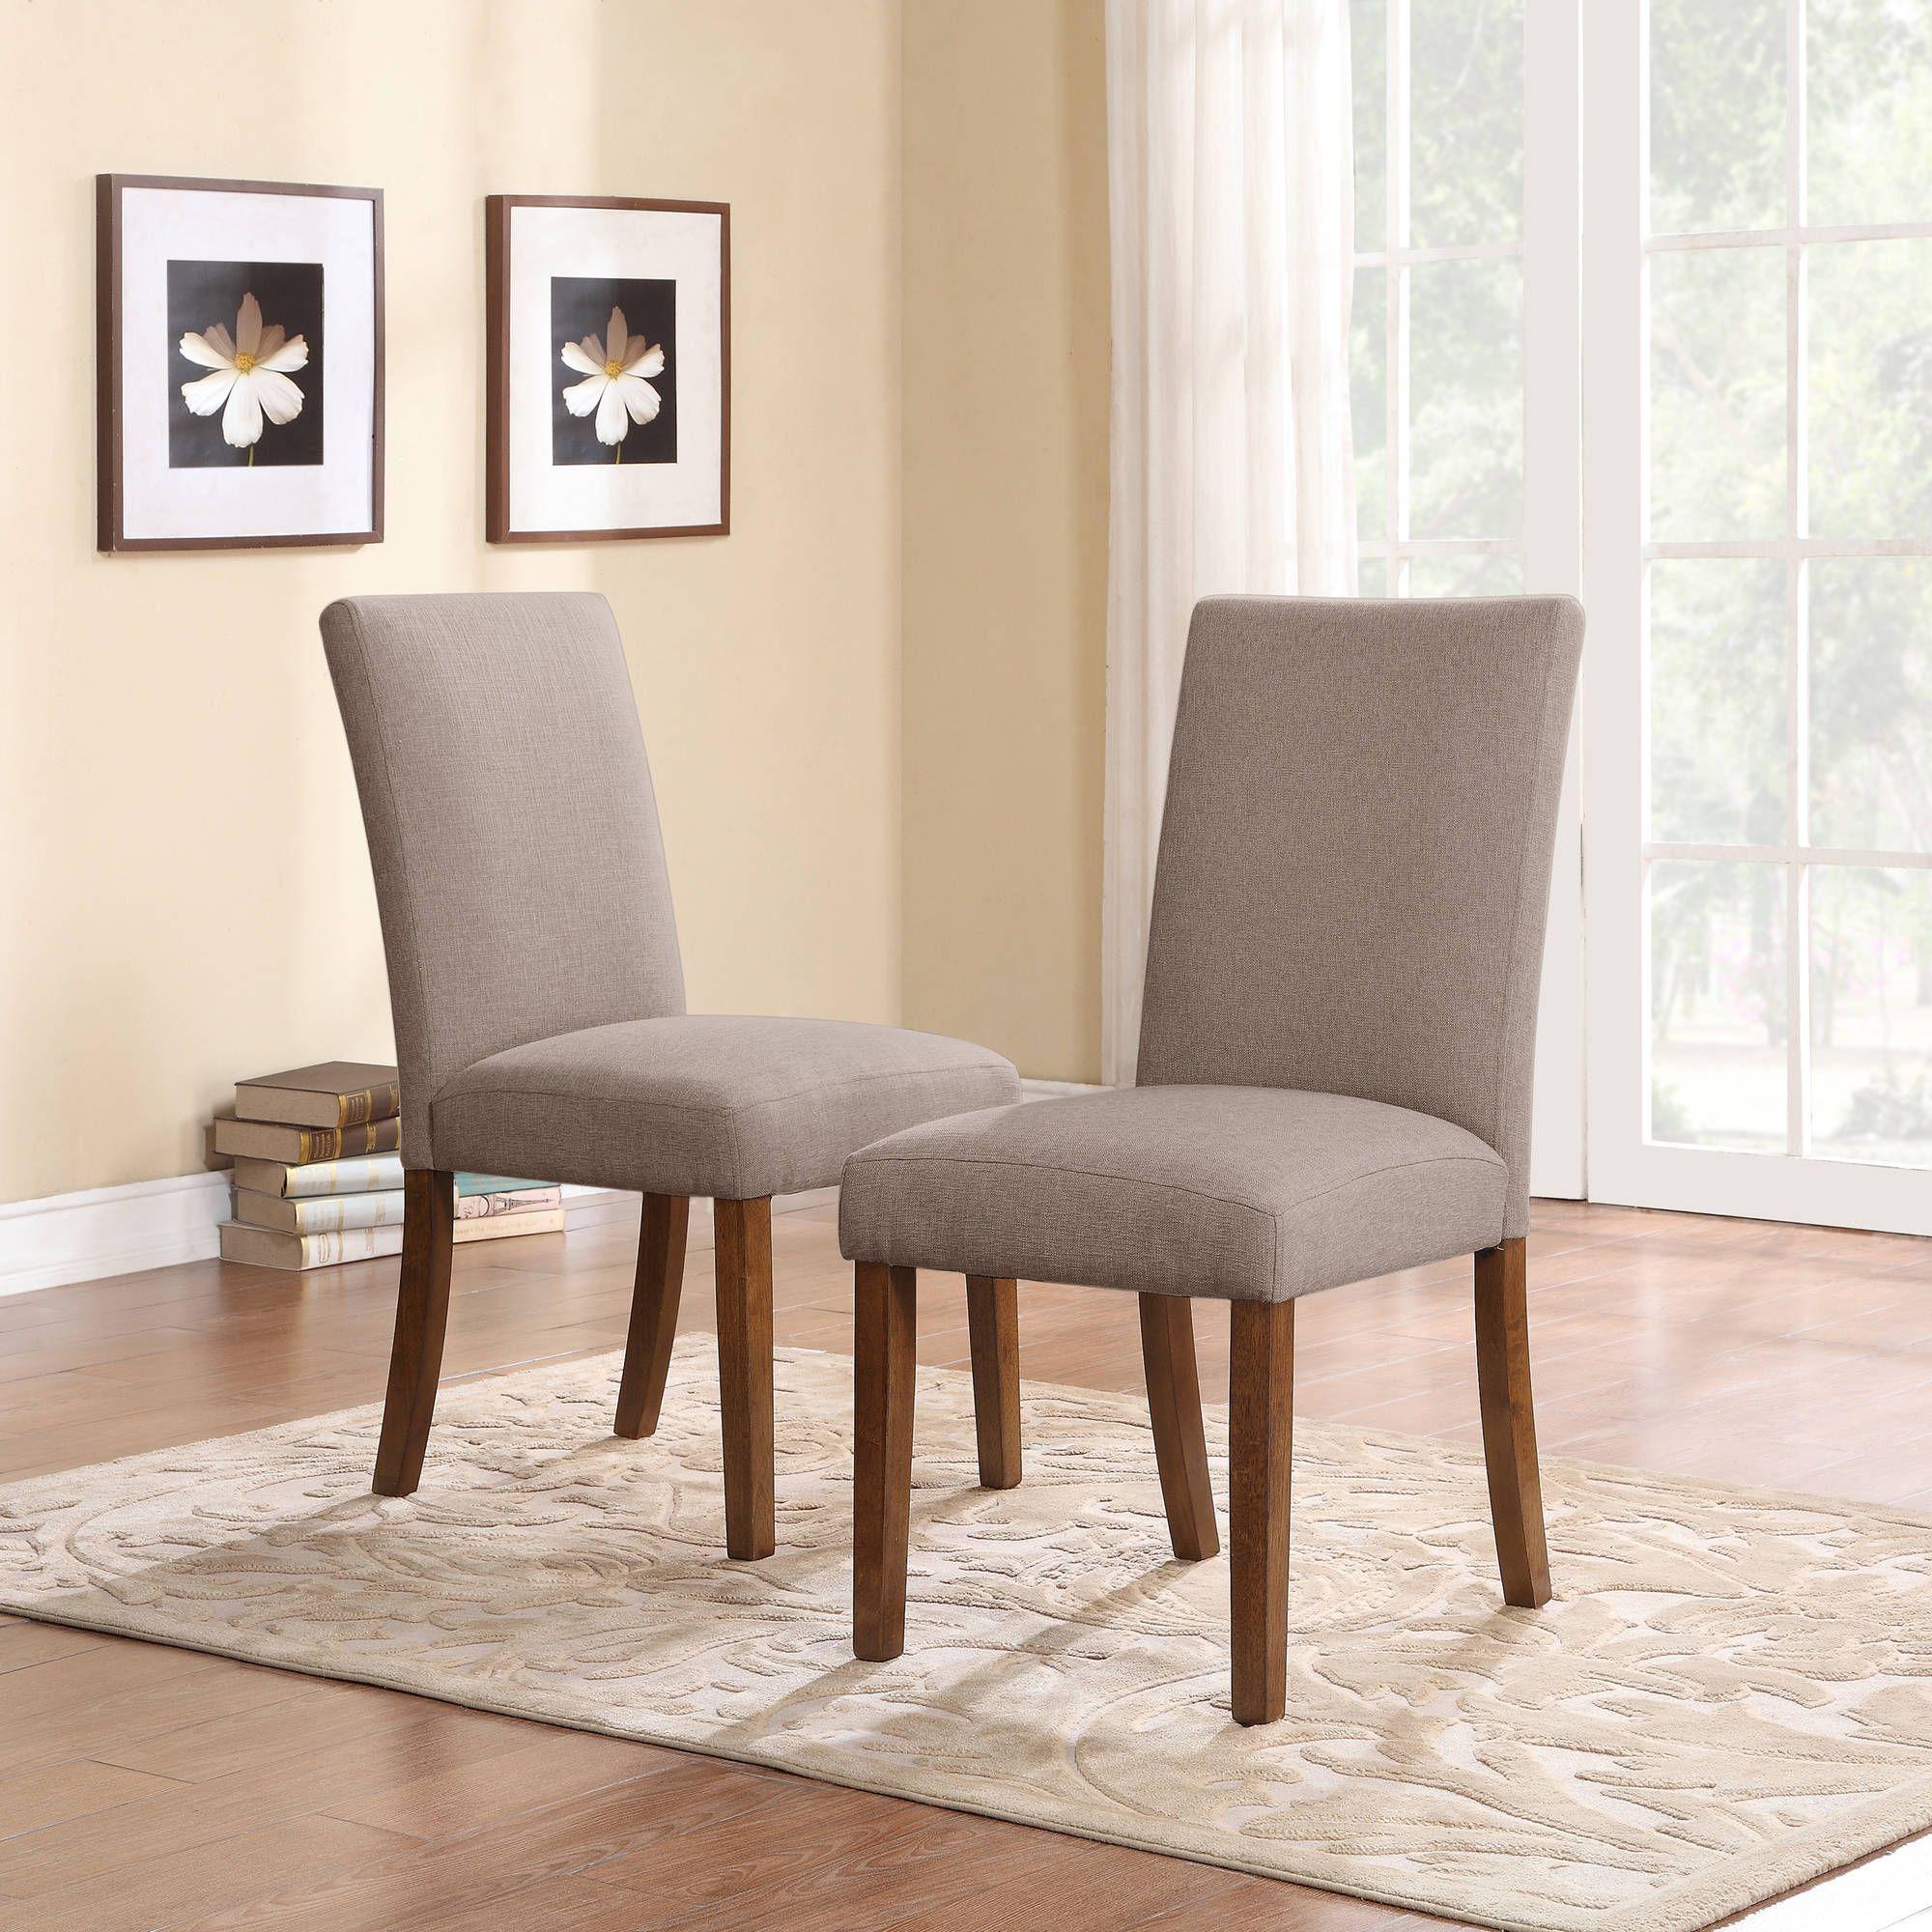 Nice Dorel Living Linen Parsons Chair, Set Of 2, Dark Pine With Gray Seats